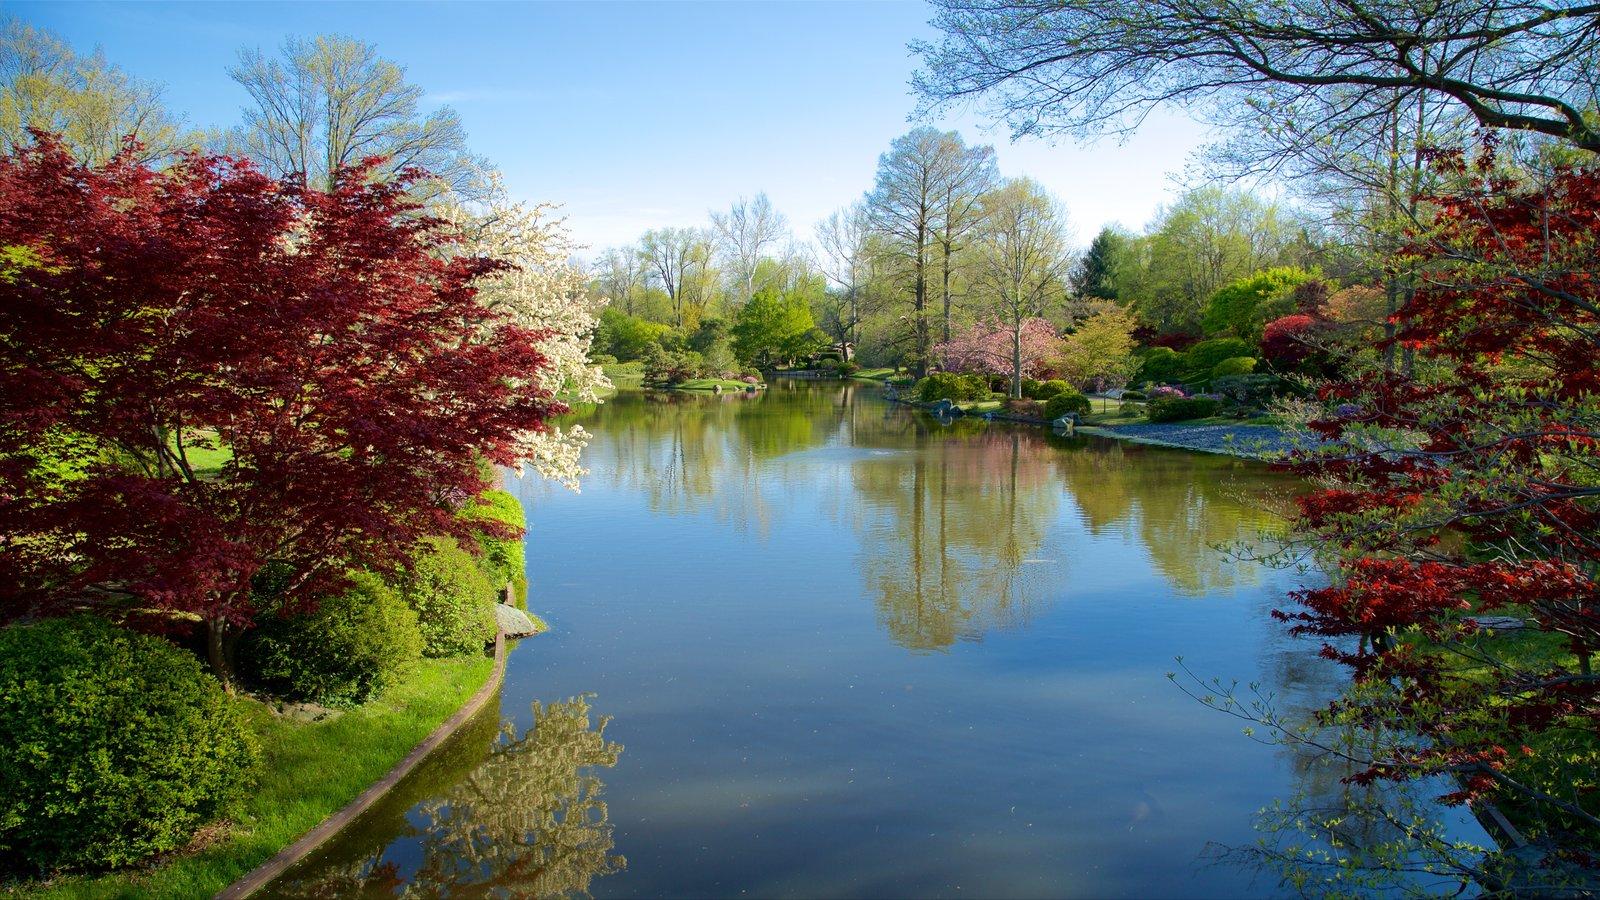 Missouri Botanical Gardens and Arboretum showing a park and a pond